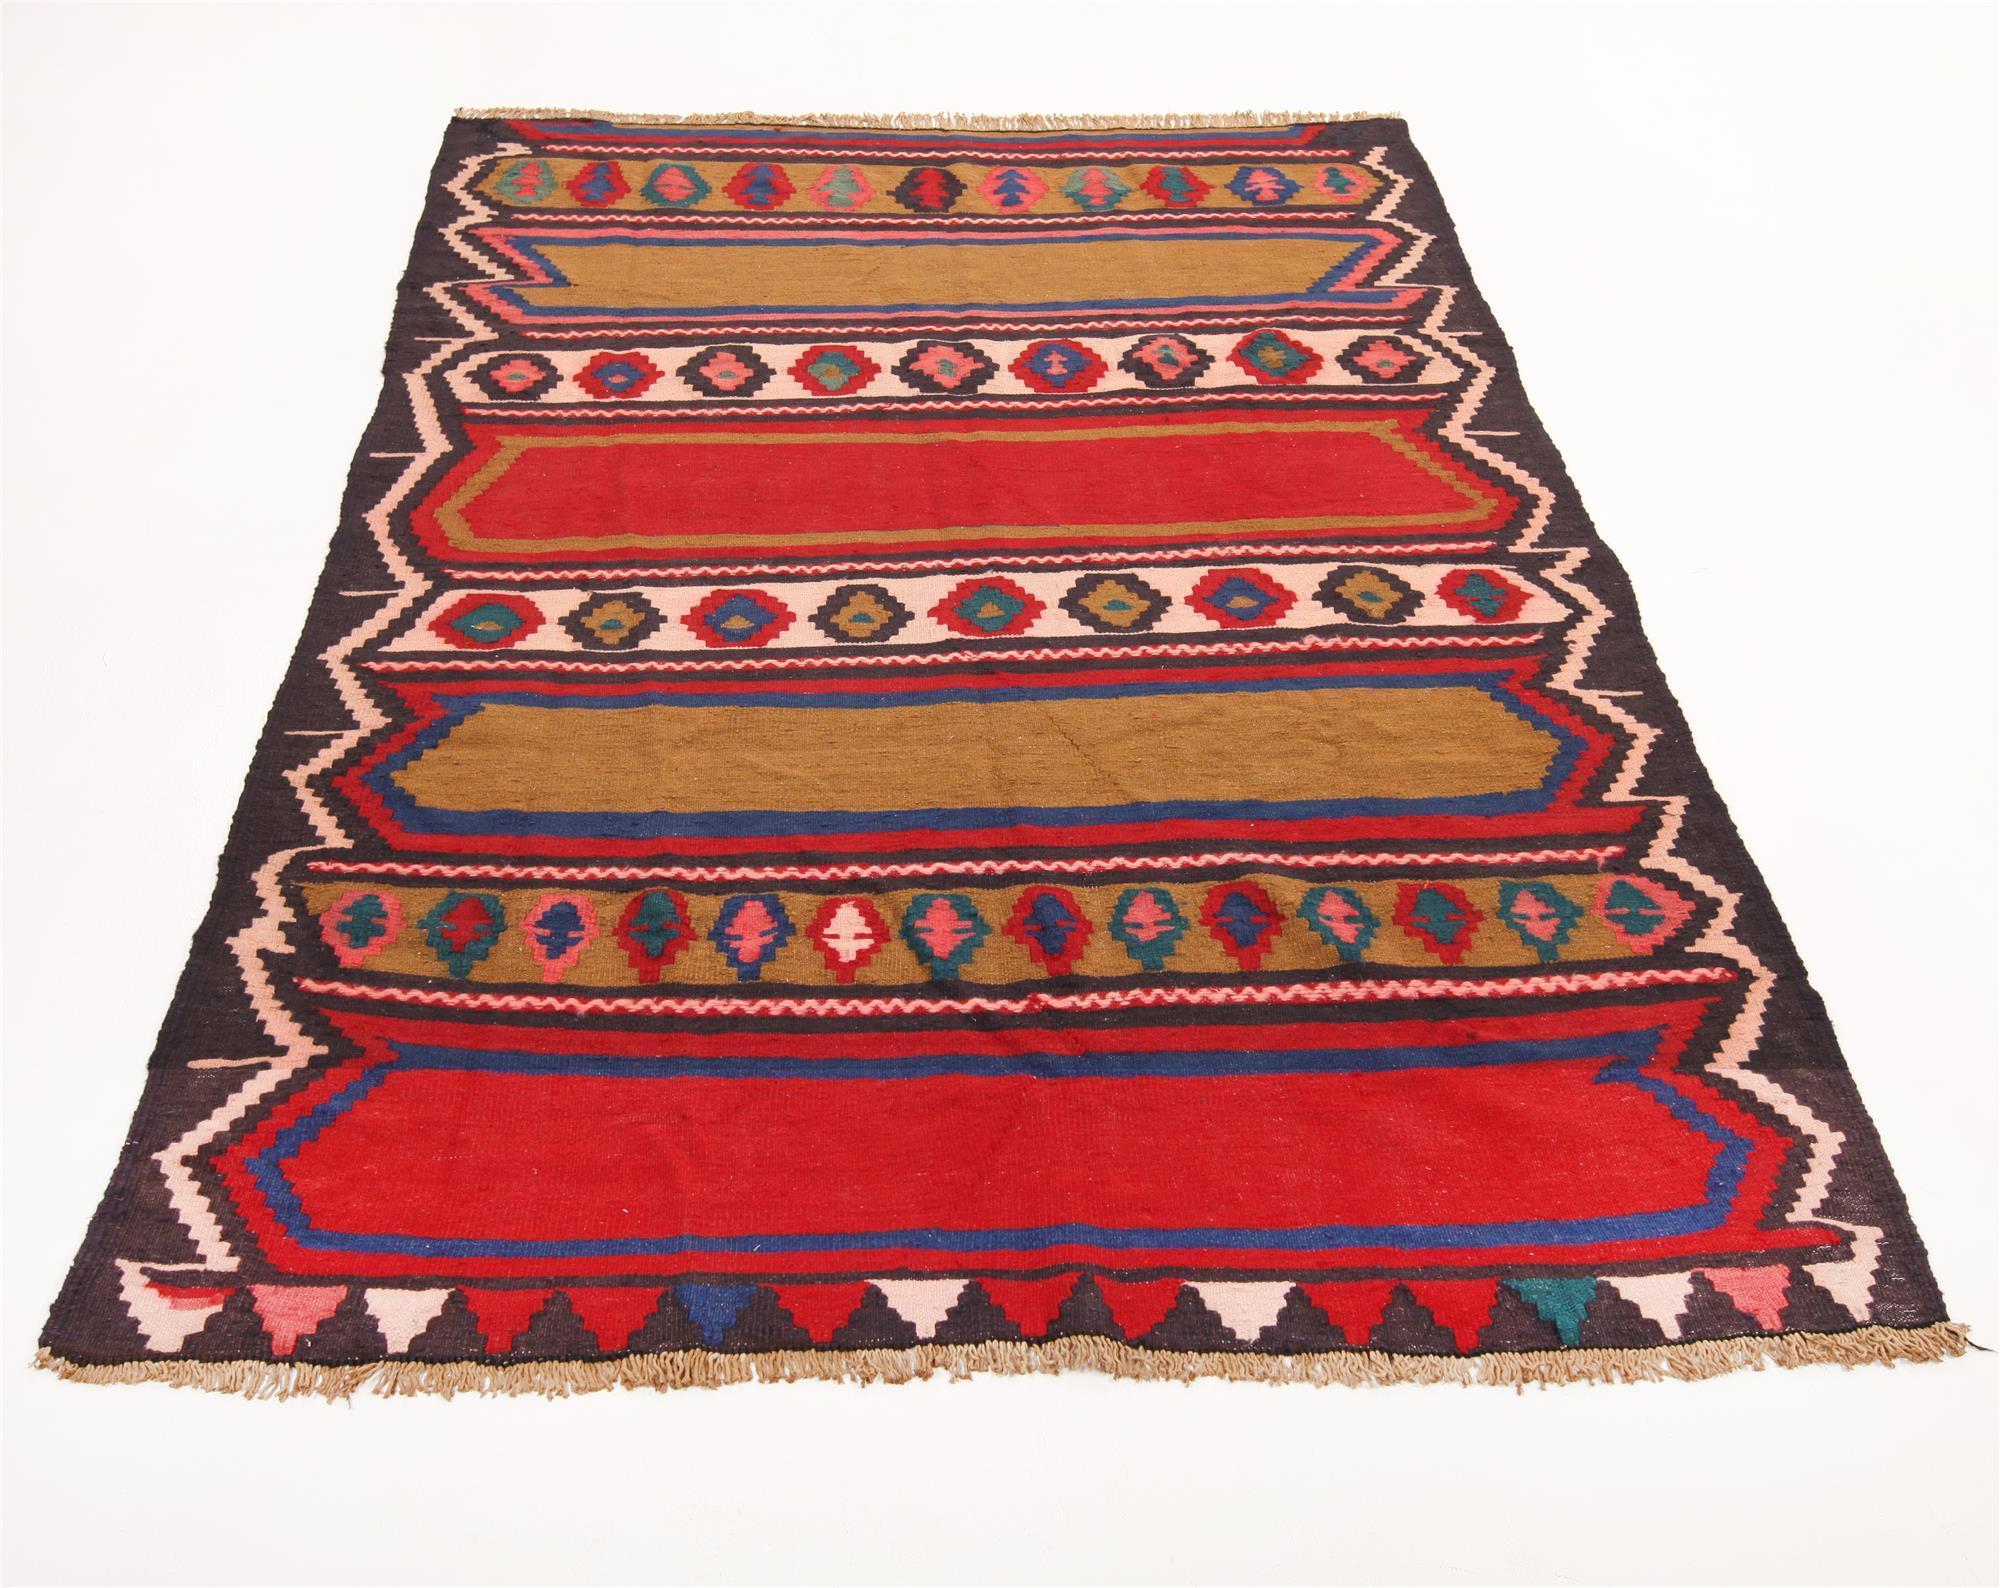 Persisk Shahsavan Kelim 262 x 190 cm - Persisk Shahsavan Kelim, nordvest Persien. Uld på bomuld. 262 x 190 cm